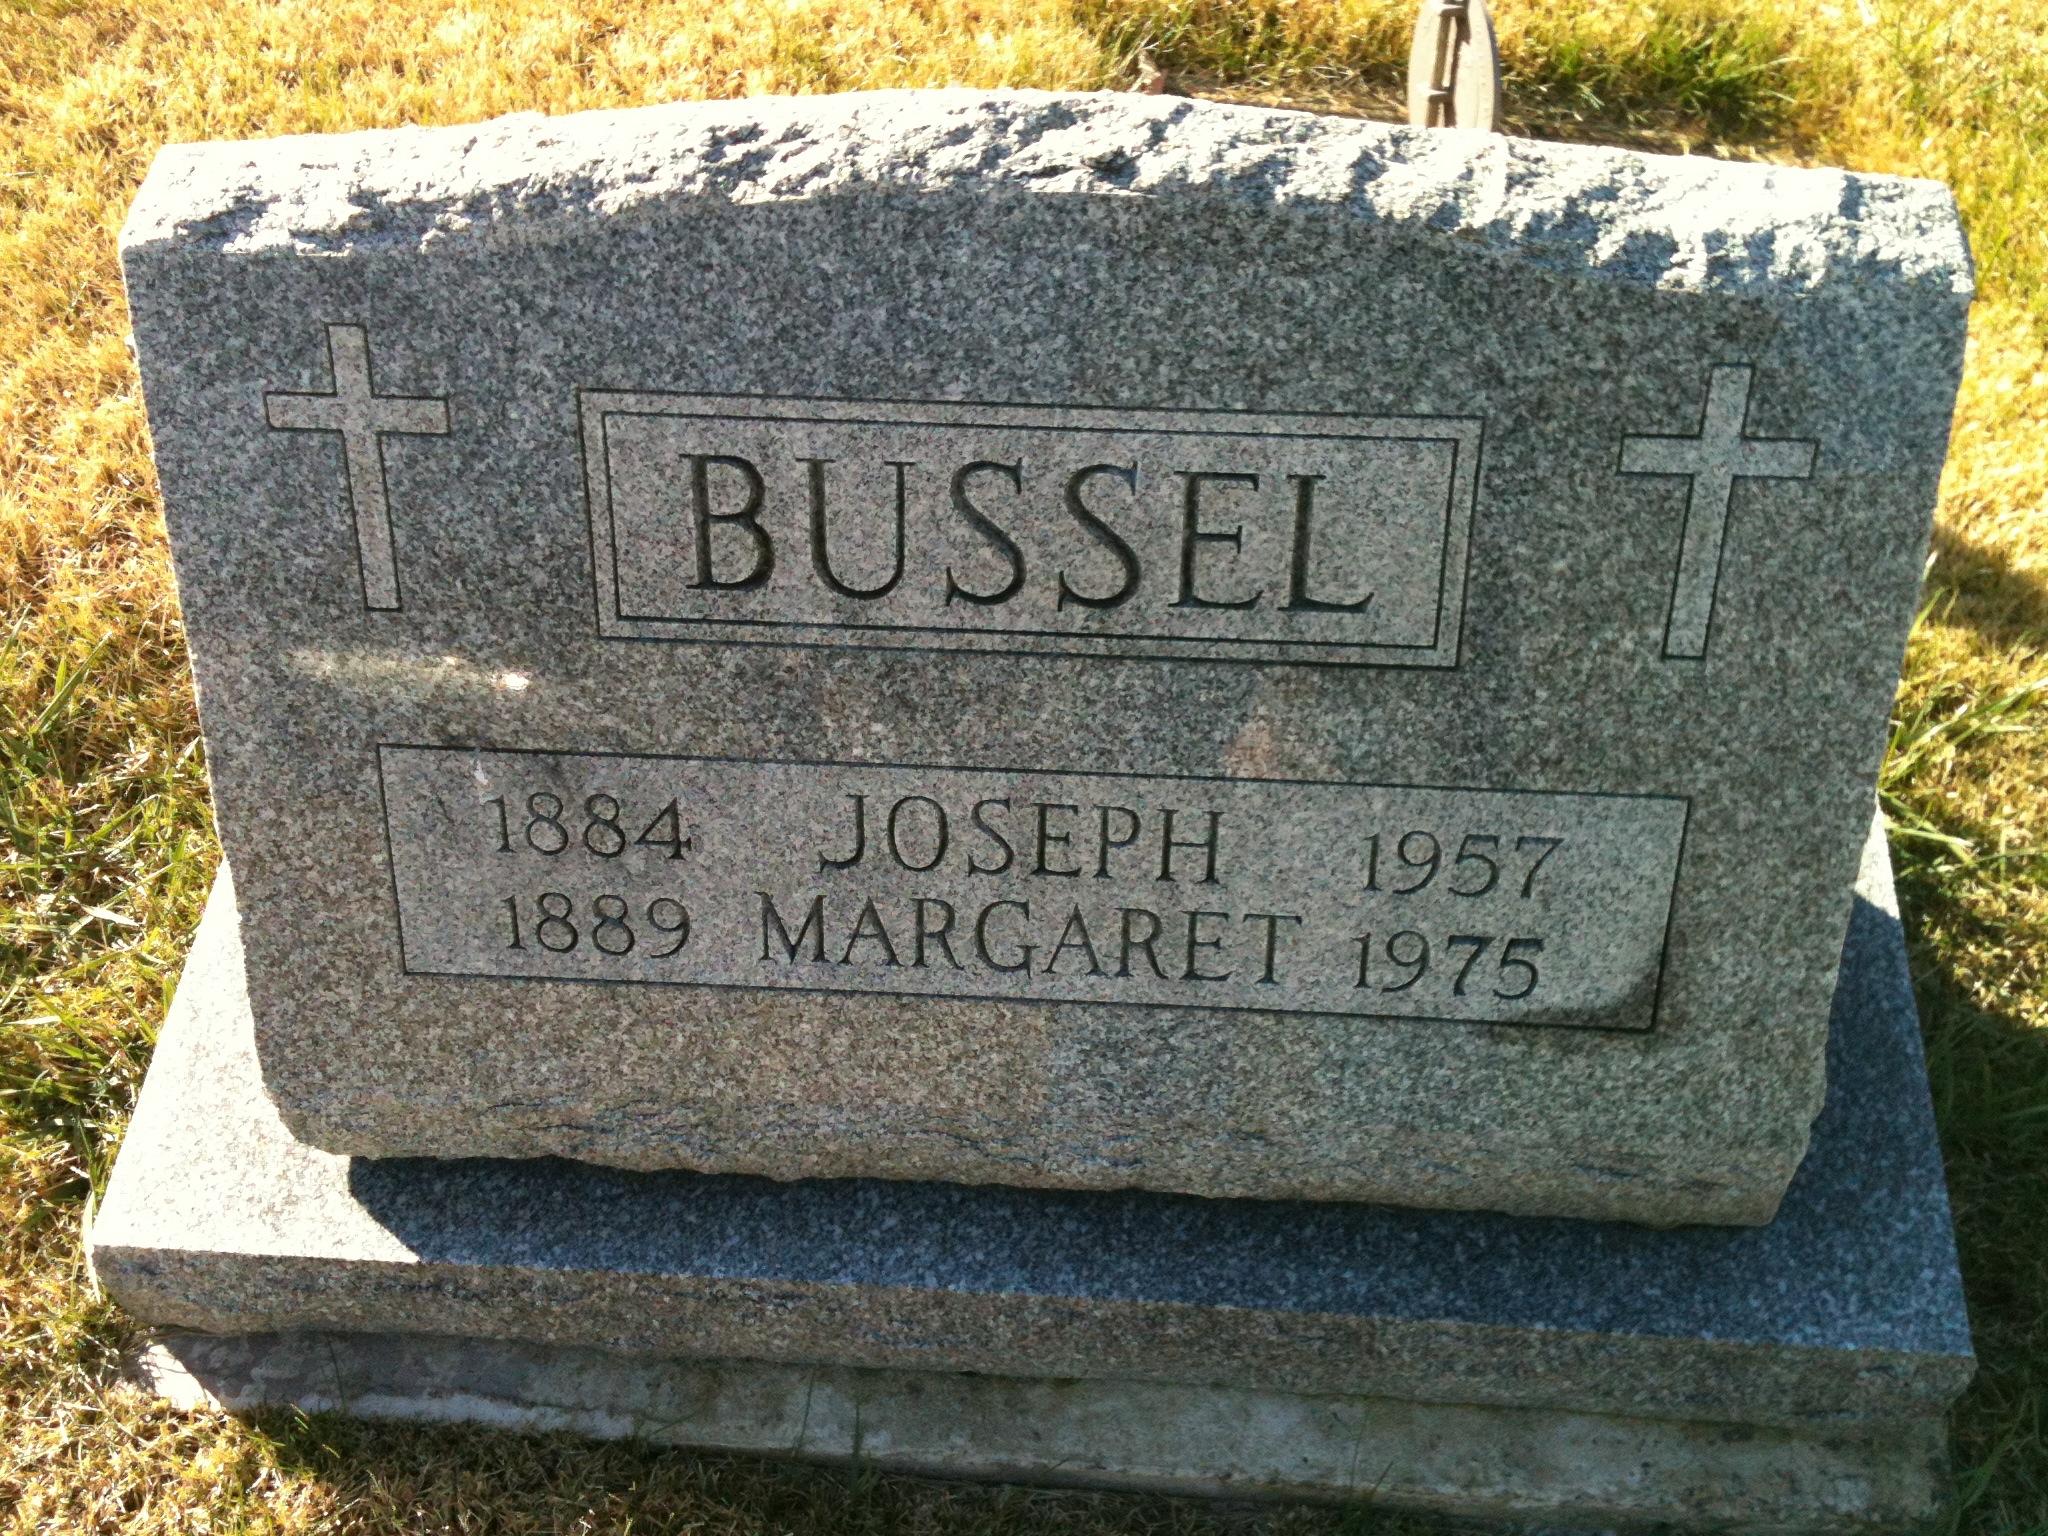 Joseph Bussel